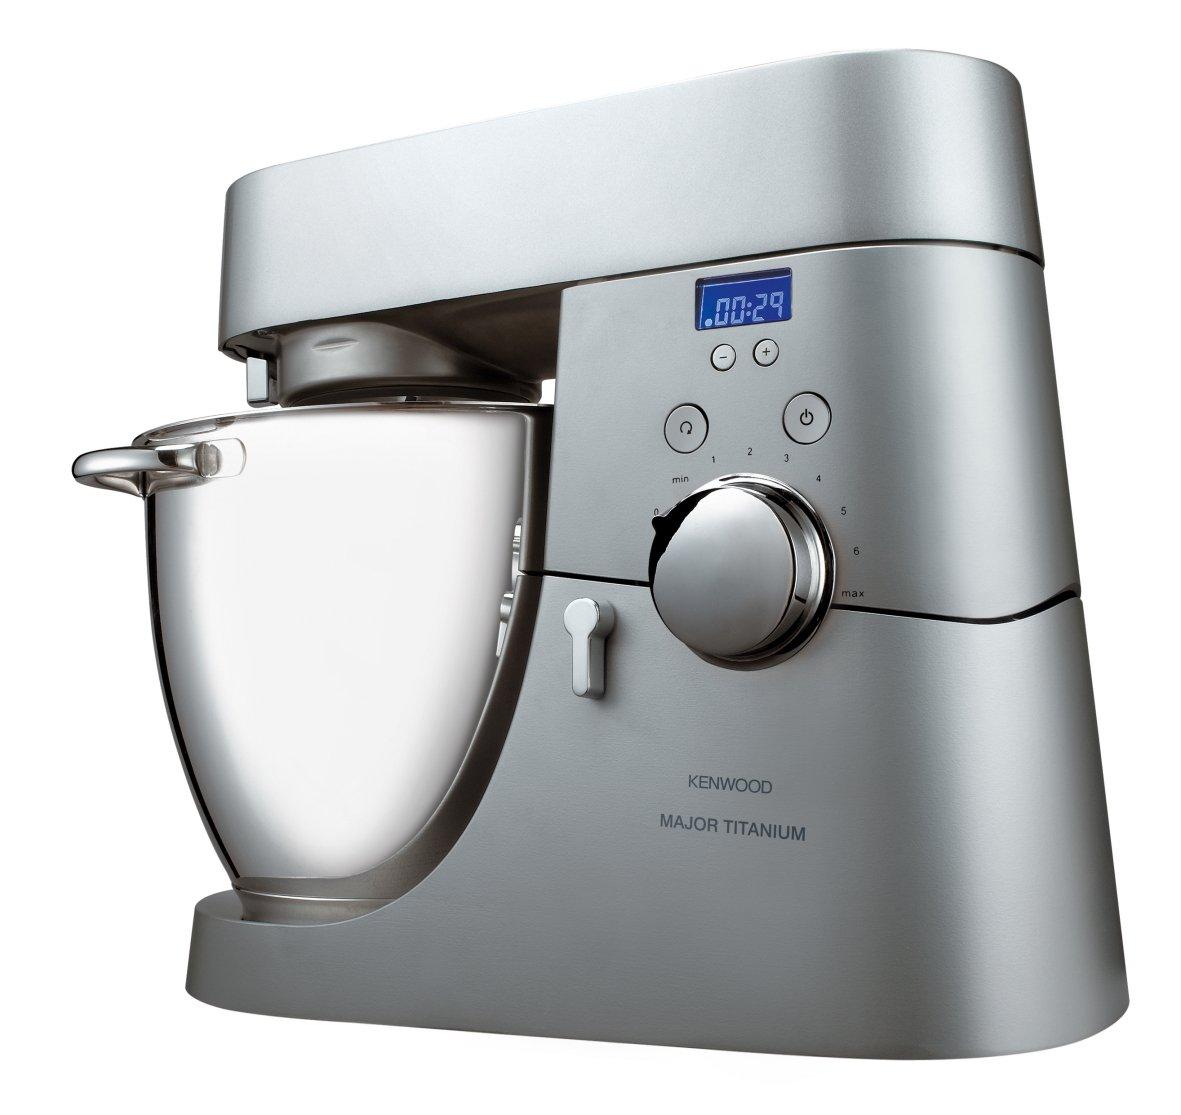 Kenwood KM040 CHEF MAJOR TITANIUM Kitchen Machine: Amazon.it: Casa e ...